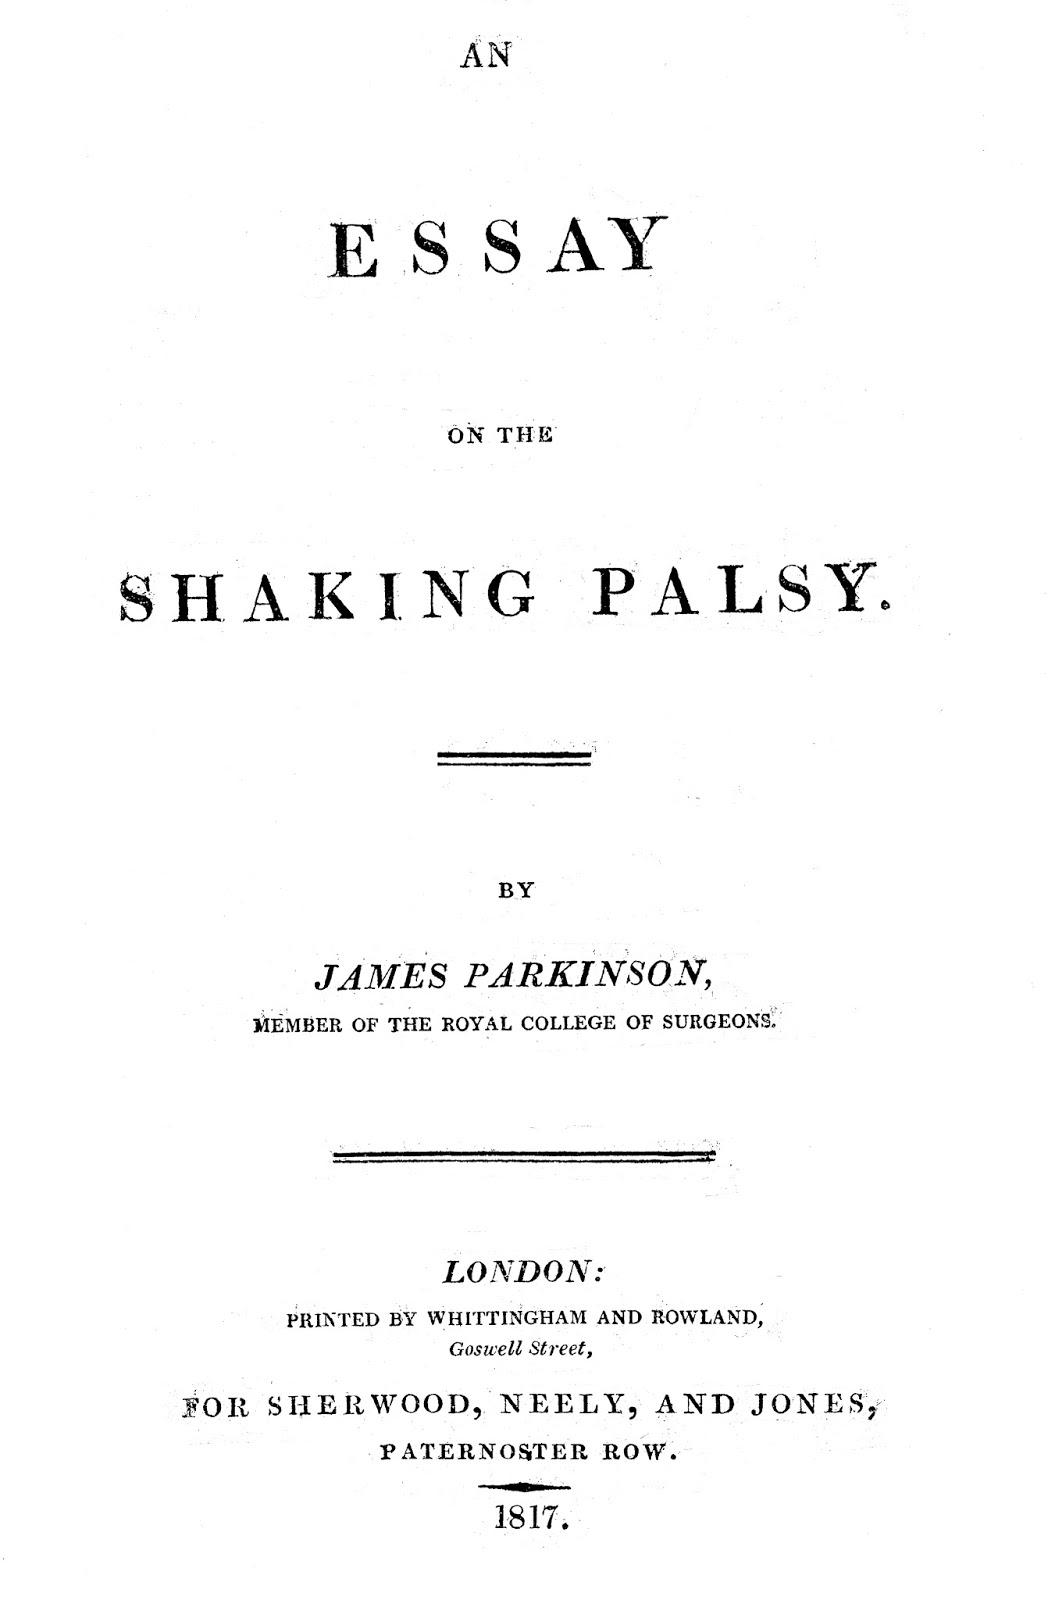 an essay on the shaking palsy traduzione